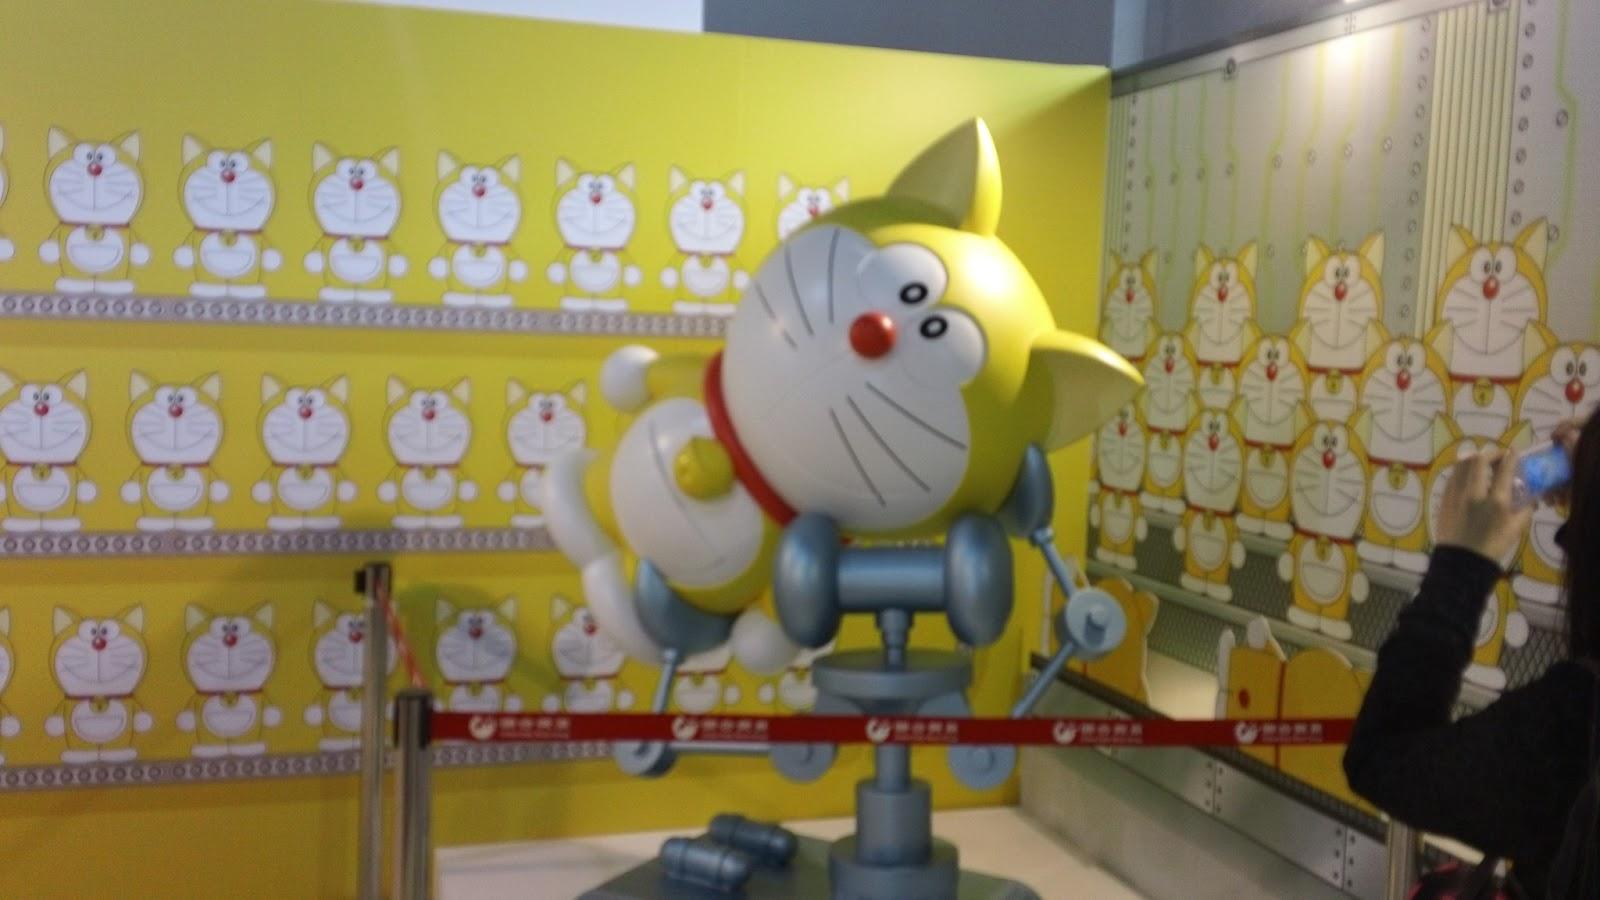 Doraemon was manufatured in 3 September 2112 in Matsushiba Robot Factory